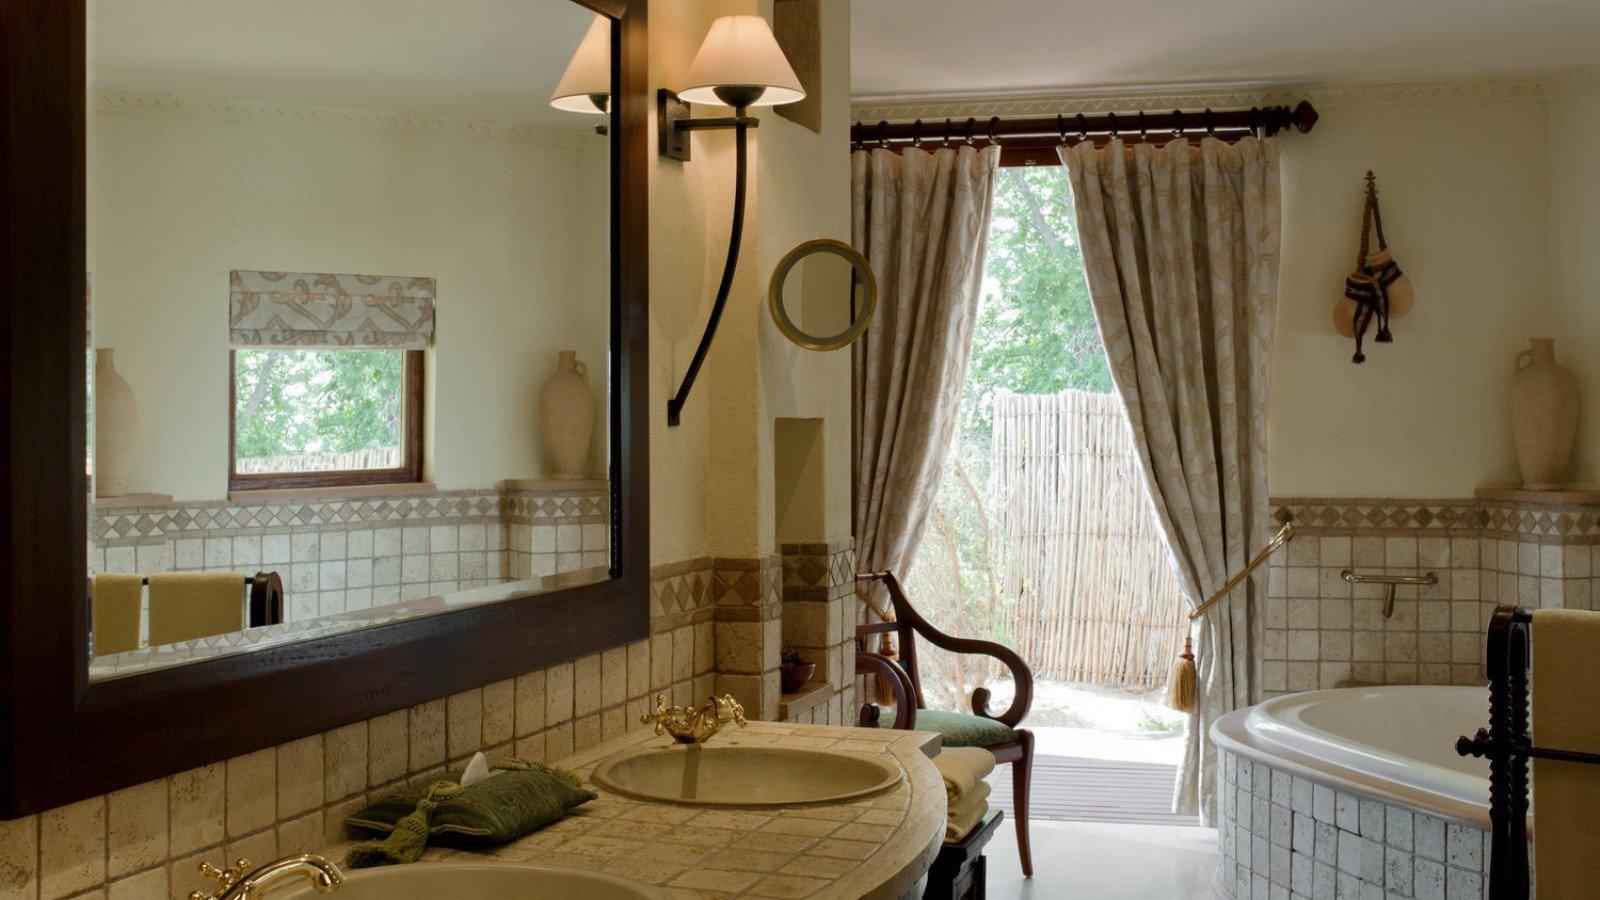 Dubai Hotels Luxury Travel Middle East bathroom property home window treatment curtain textile decor window valance tub Bath tile bathtub tiled